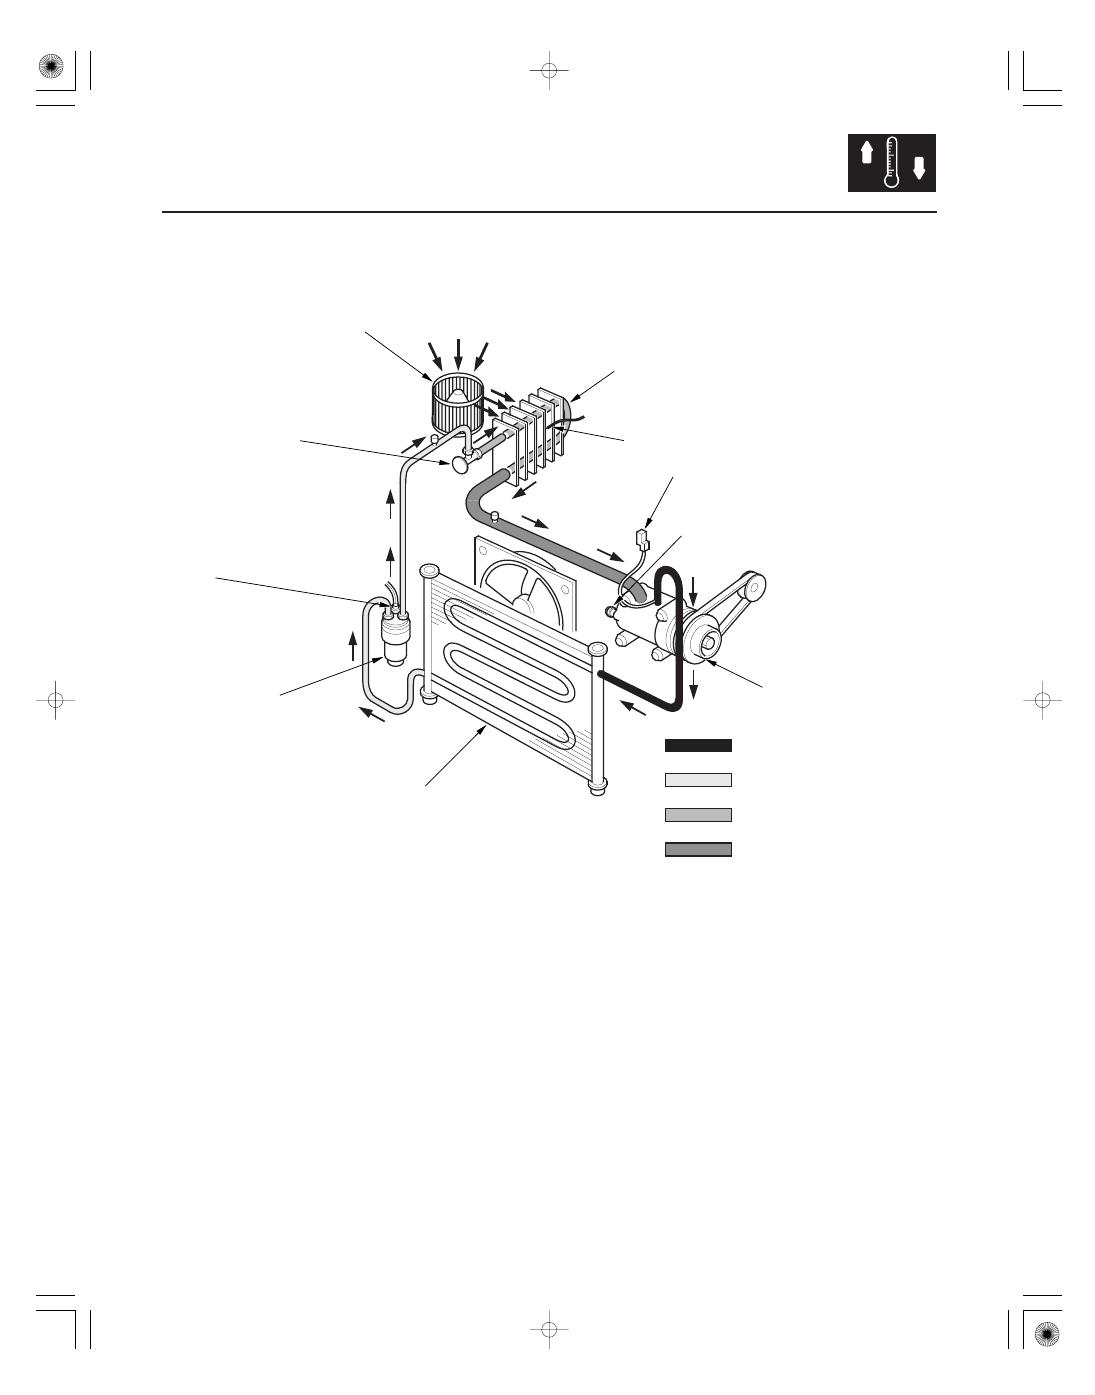 Acura Rsx Honda Integra Manual Part 401 Fuse Relay Box